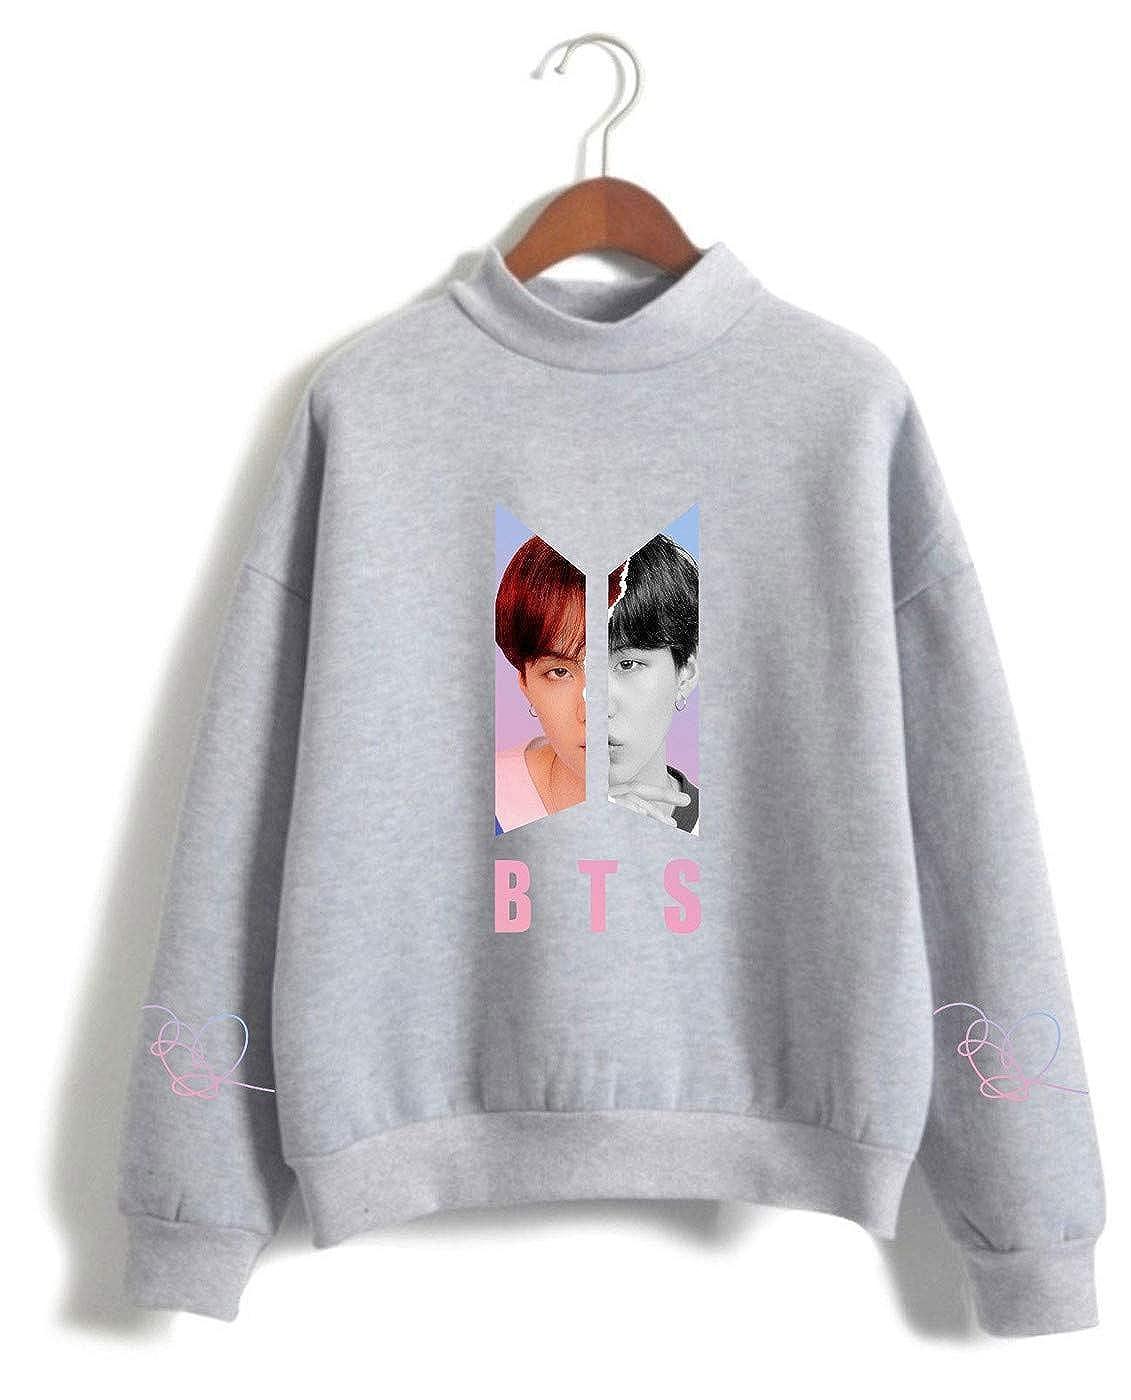 SIMYJOY Womens BTS Fans Sweatshirt Kpop Concert Idol Support Pullover Girls Cute Jumper Loose Fitting Top Nice Gift